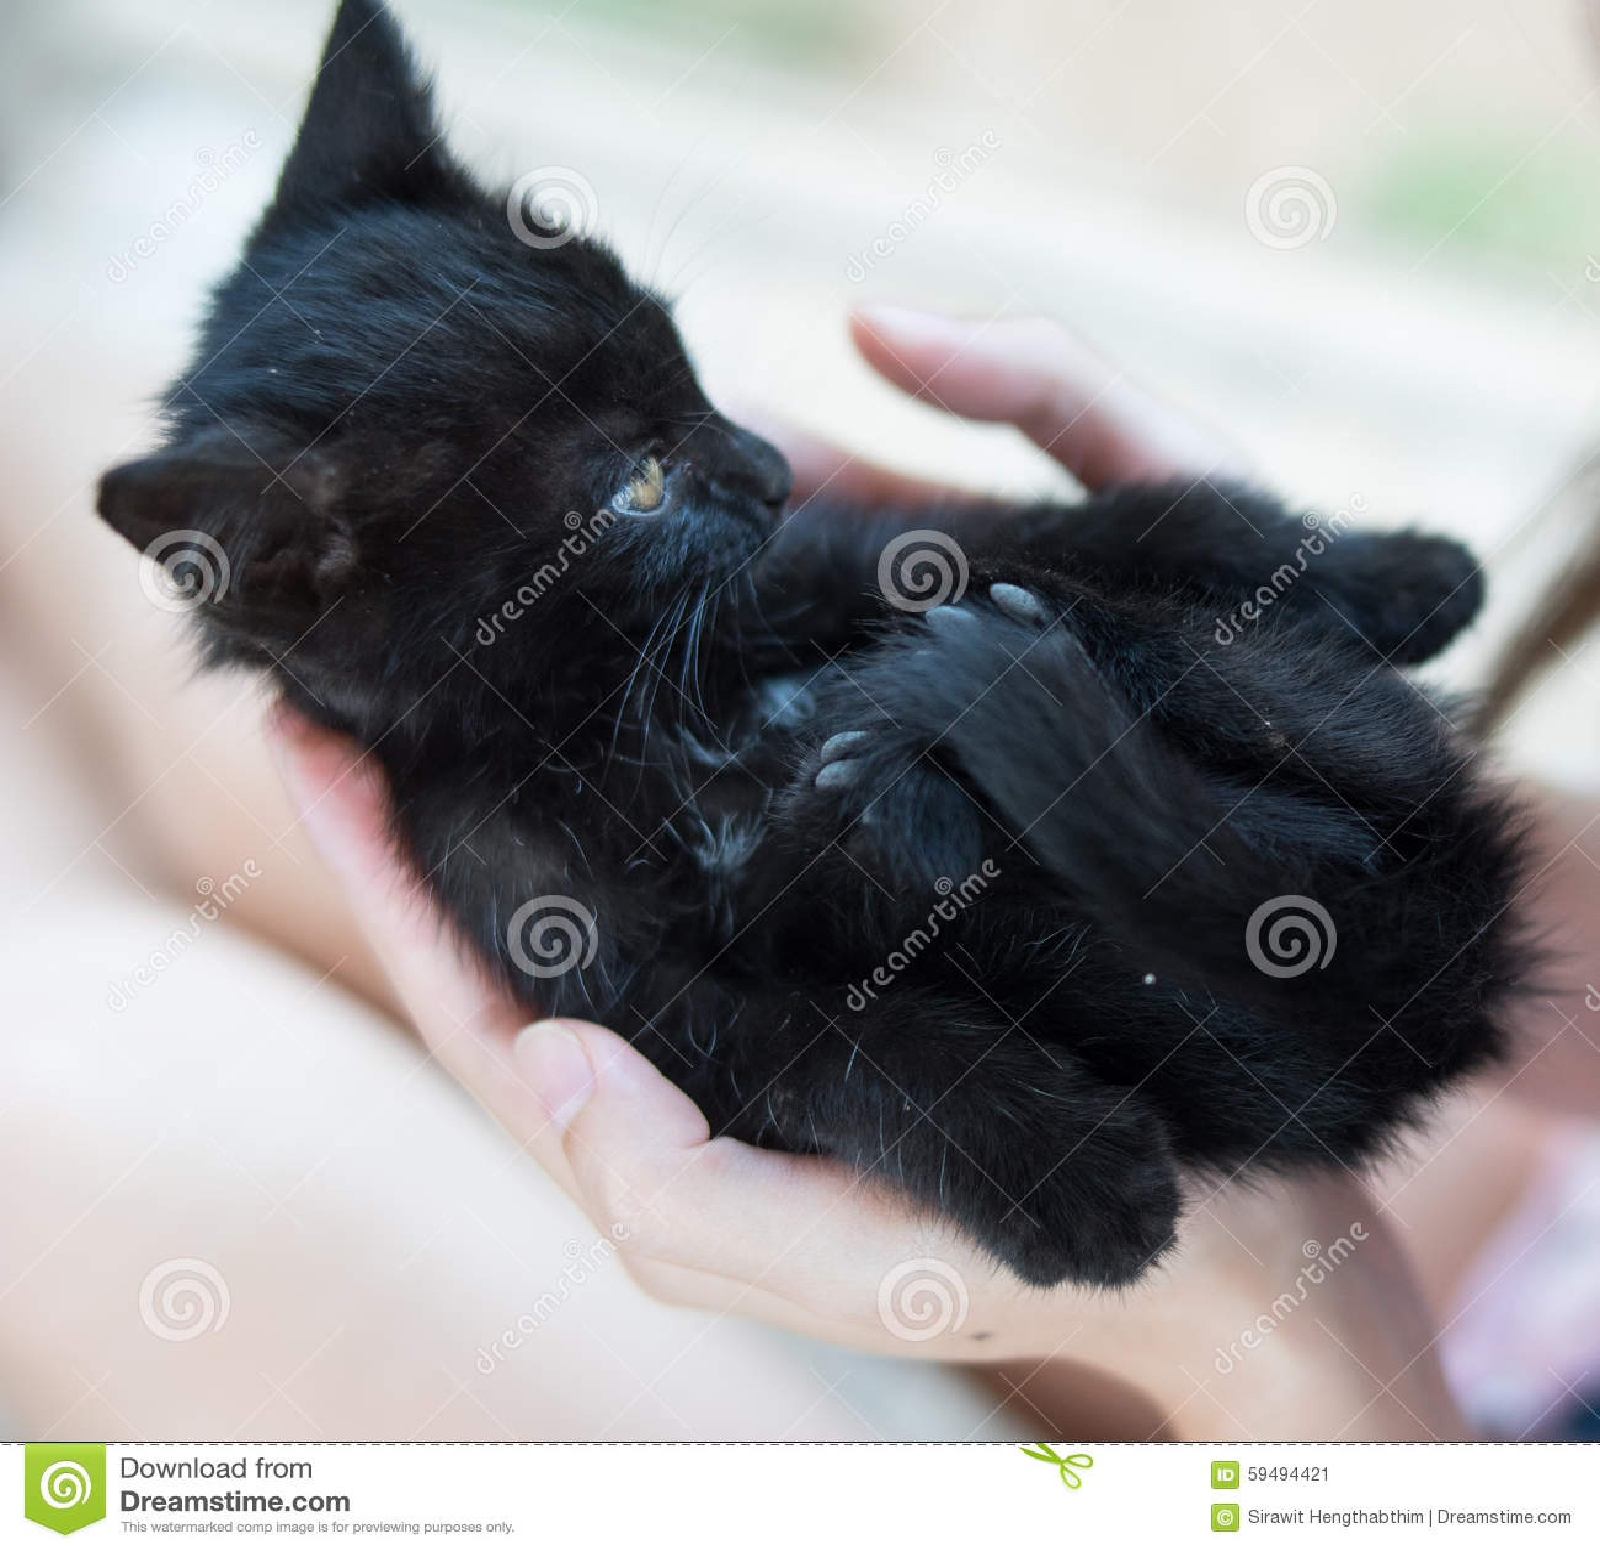 Baby Black Cat Stock Photo - Image: 59494421